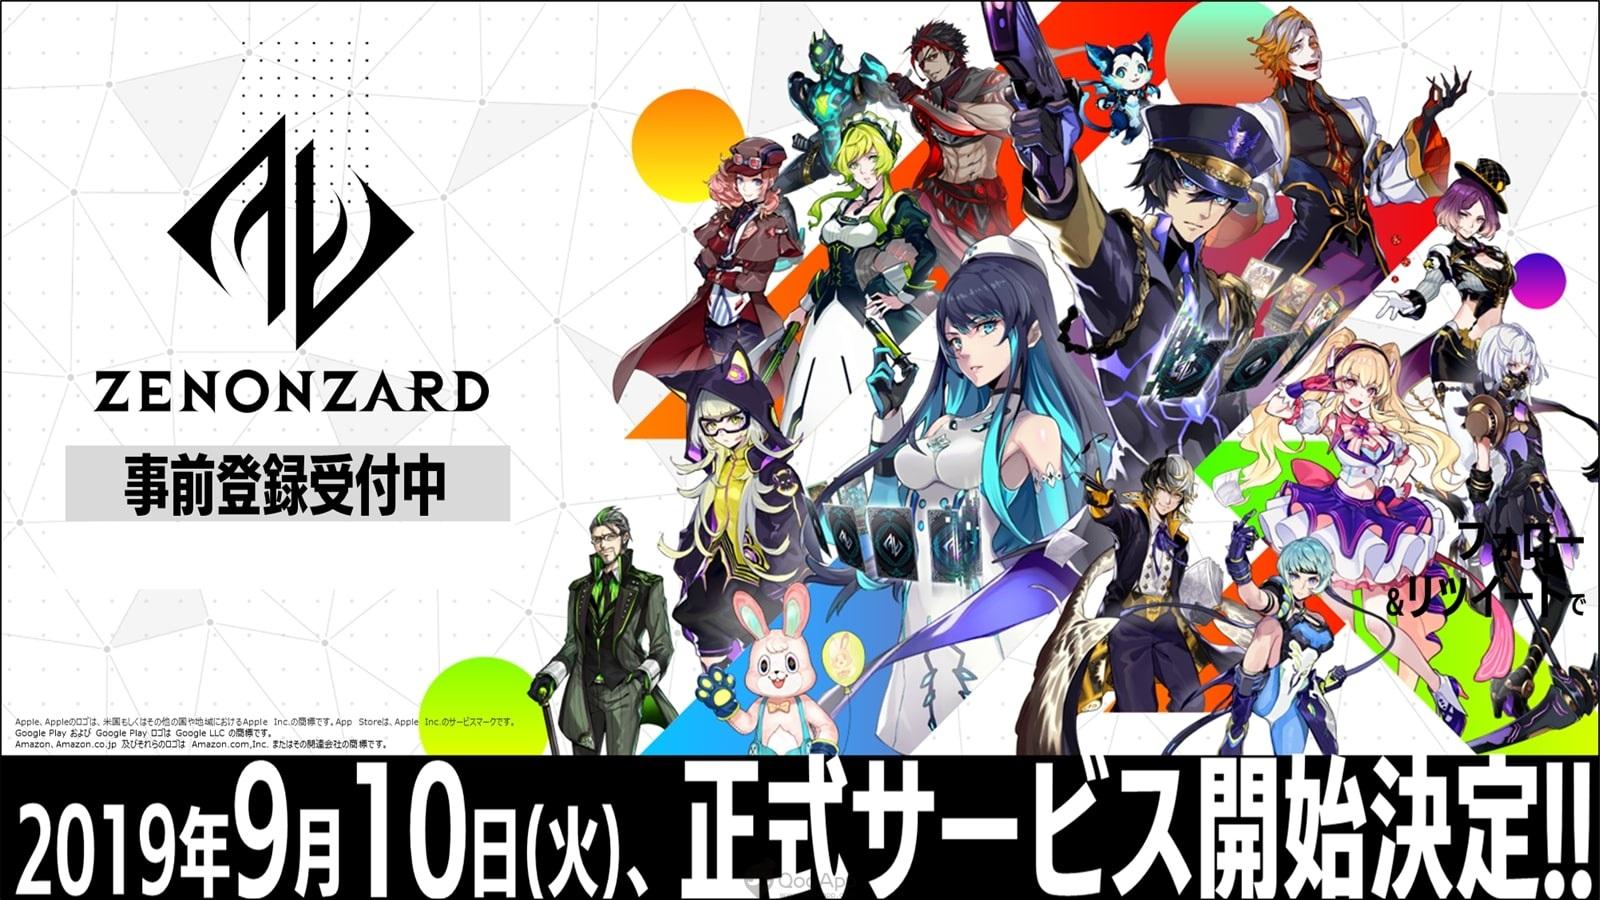 AI卡牌對戰遊戲《ZENONZARD》宣佈9月10日推出!原創動畫亦預定於今夏配佈!